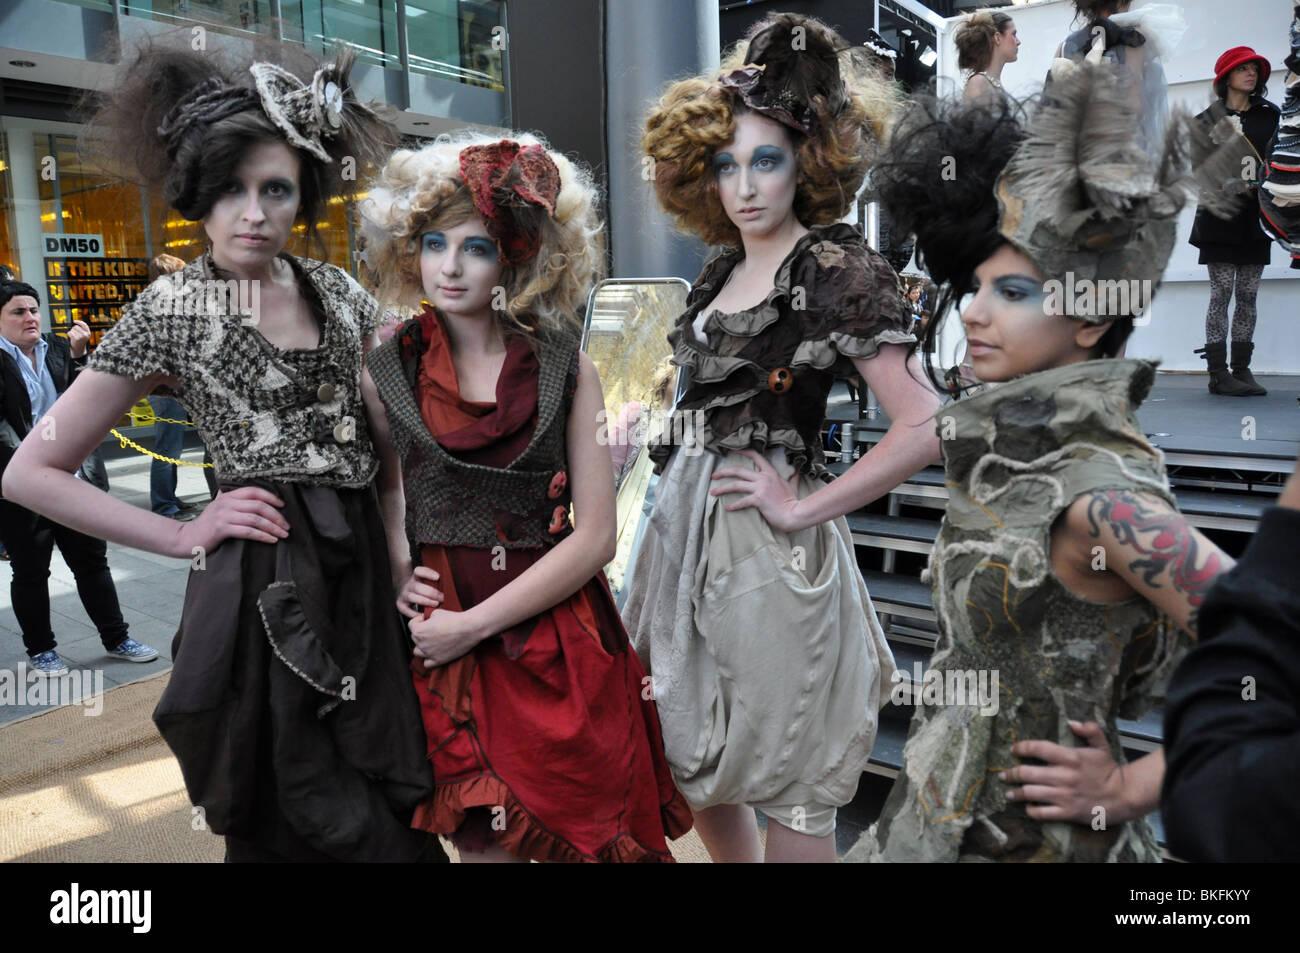 Models wait at London's annual Alternative Fashion Week-Spitalfields. England UK Stock Photo